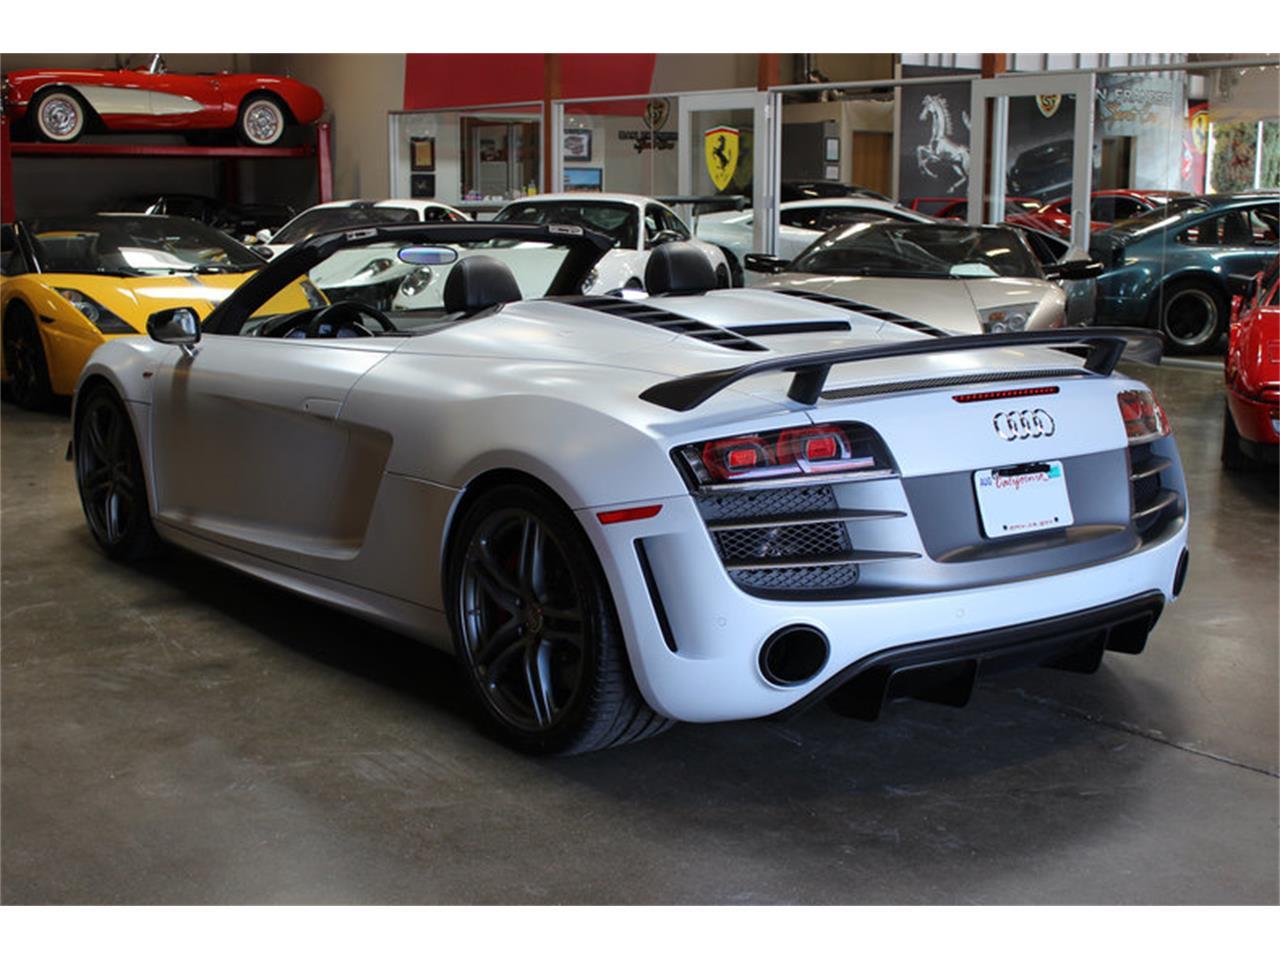 Audi Stevens Creek Service >> 2012 Audi R8 Spyder GT for Sale   ClassicCars.com   CC-1016596